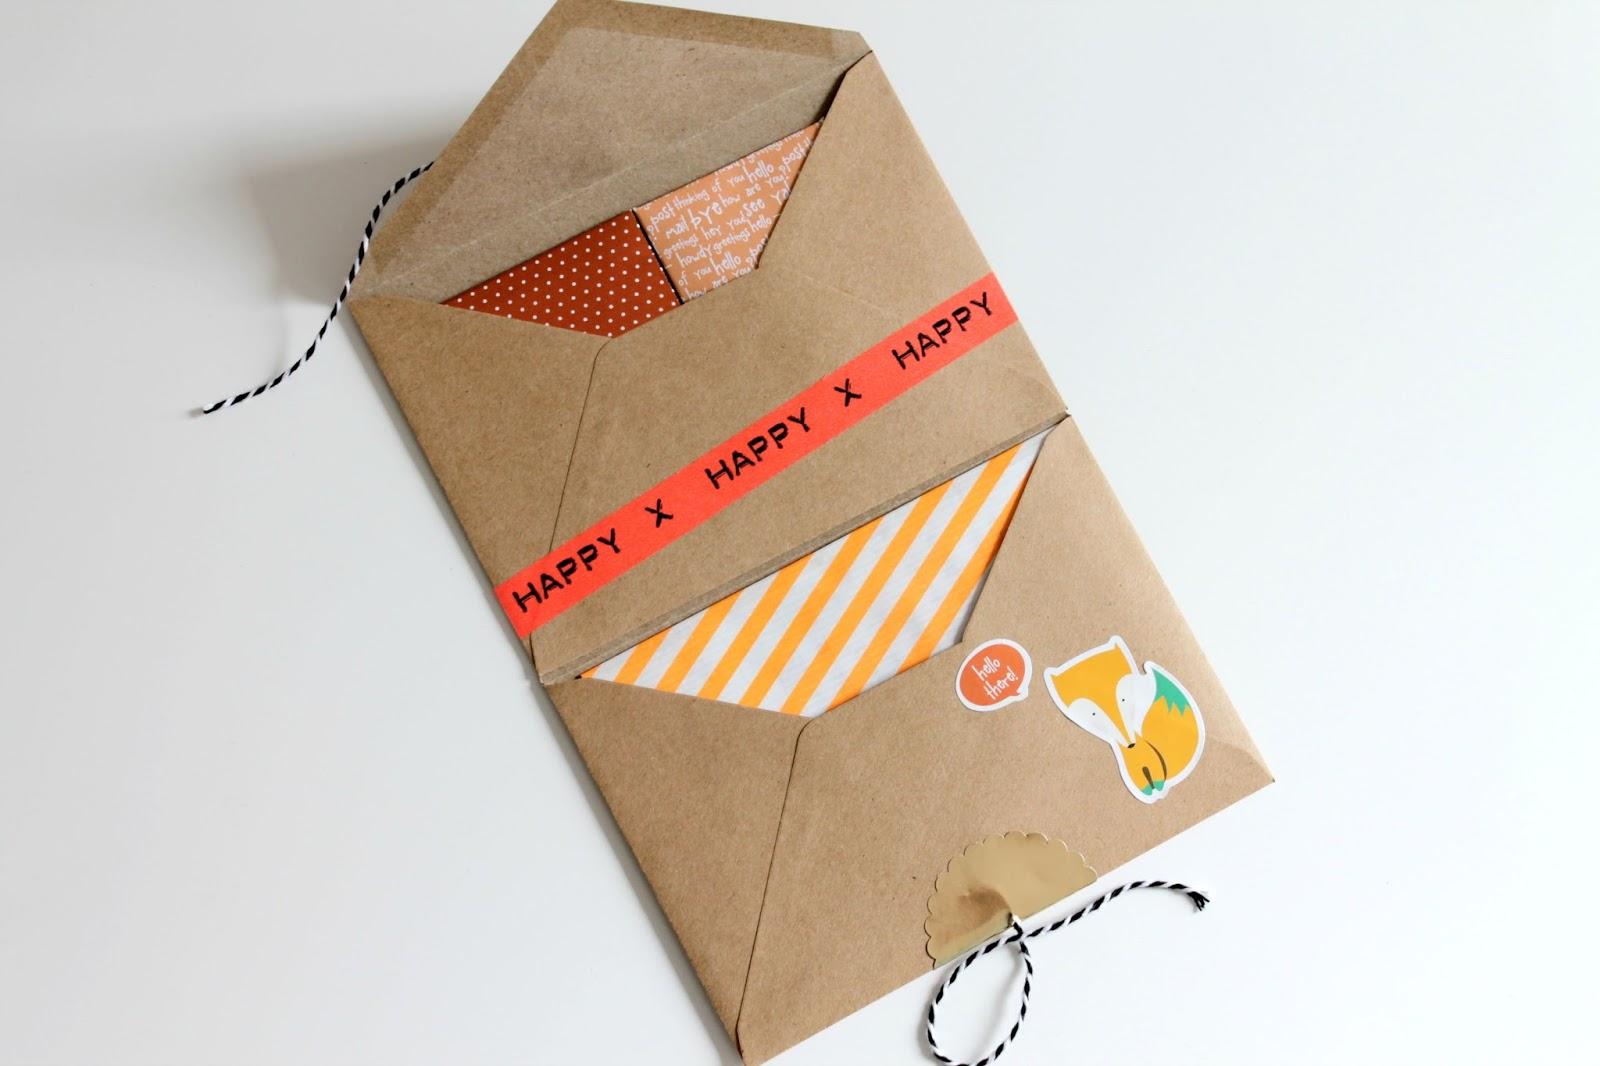 Snailmail enveloppenmapje met vossen thema 365 miles to for Cadeauzakjes papier hema